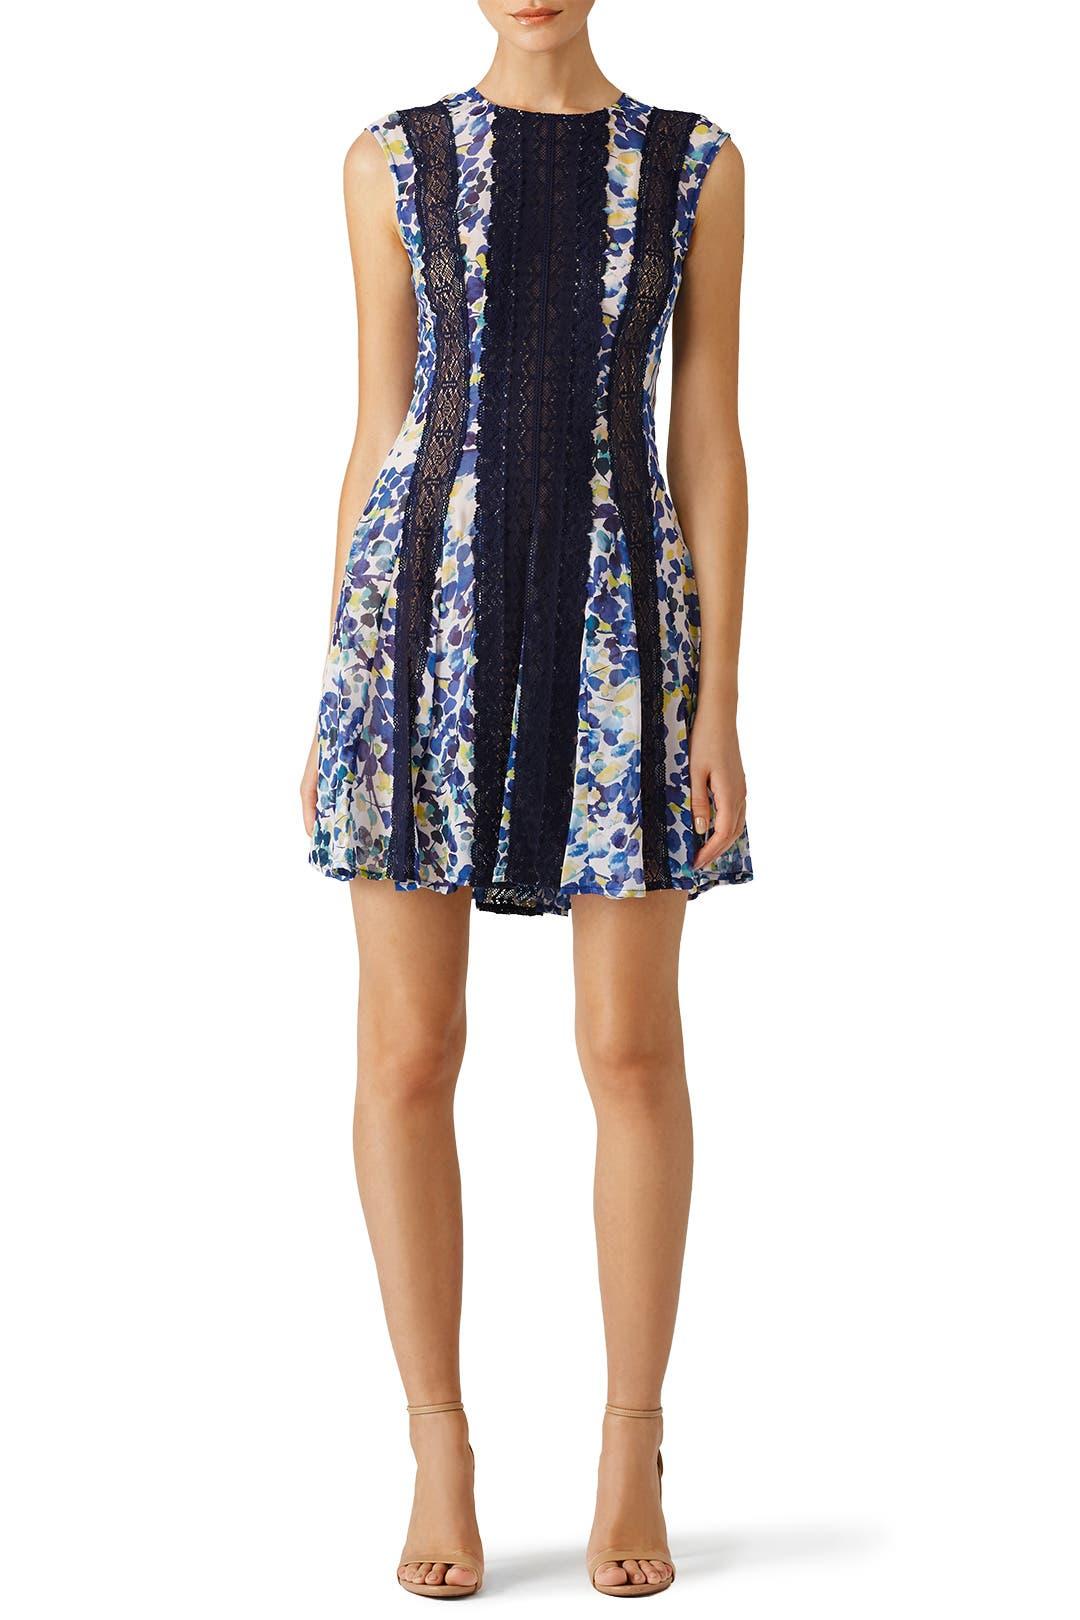 BCBGMAXAZRIA Blue Floral Jalena Dress